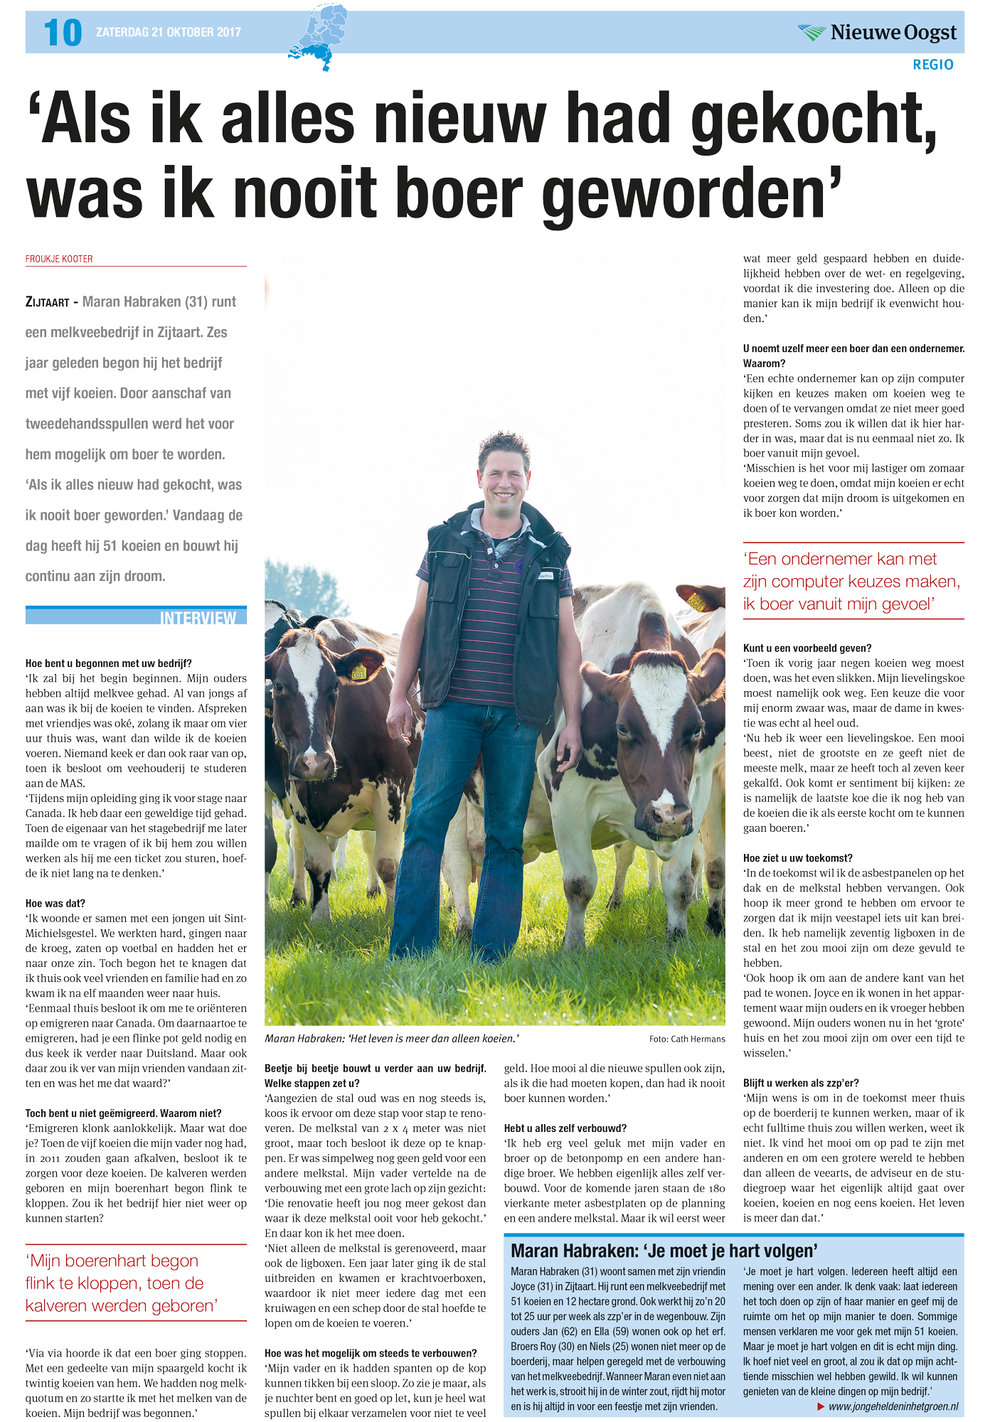 Nieuweoogst-maranhabraken-21-11-17.jpg